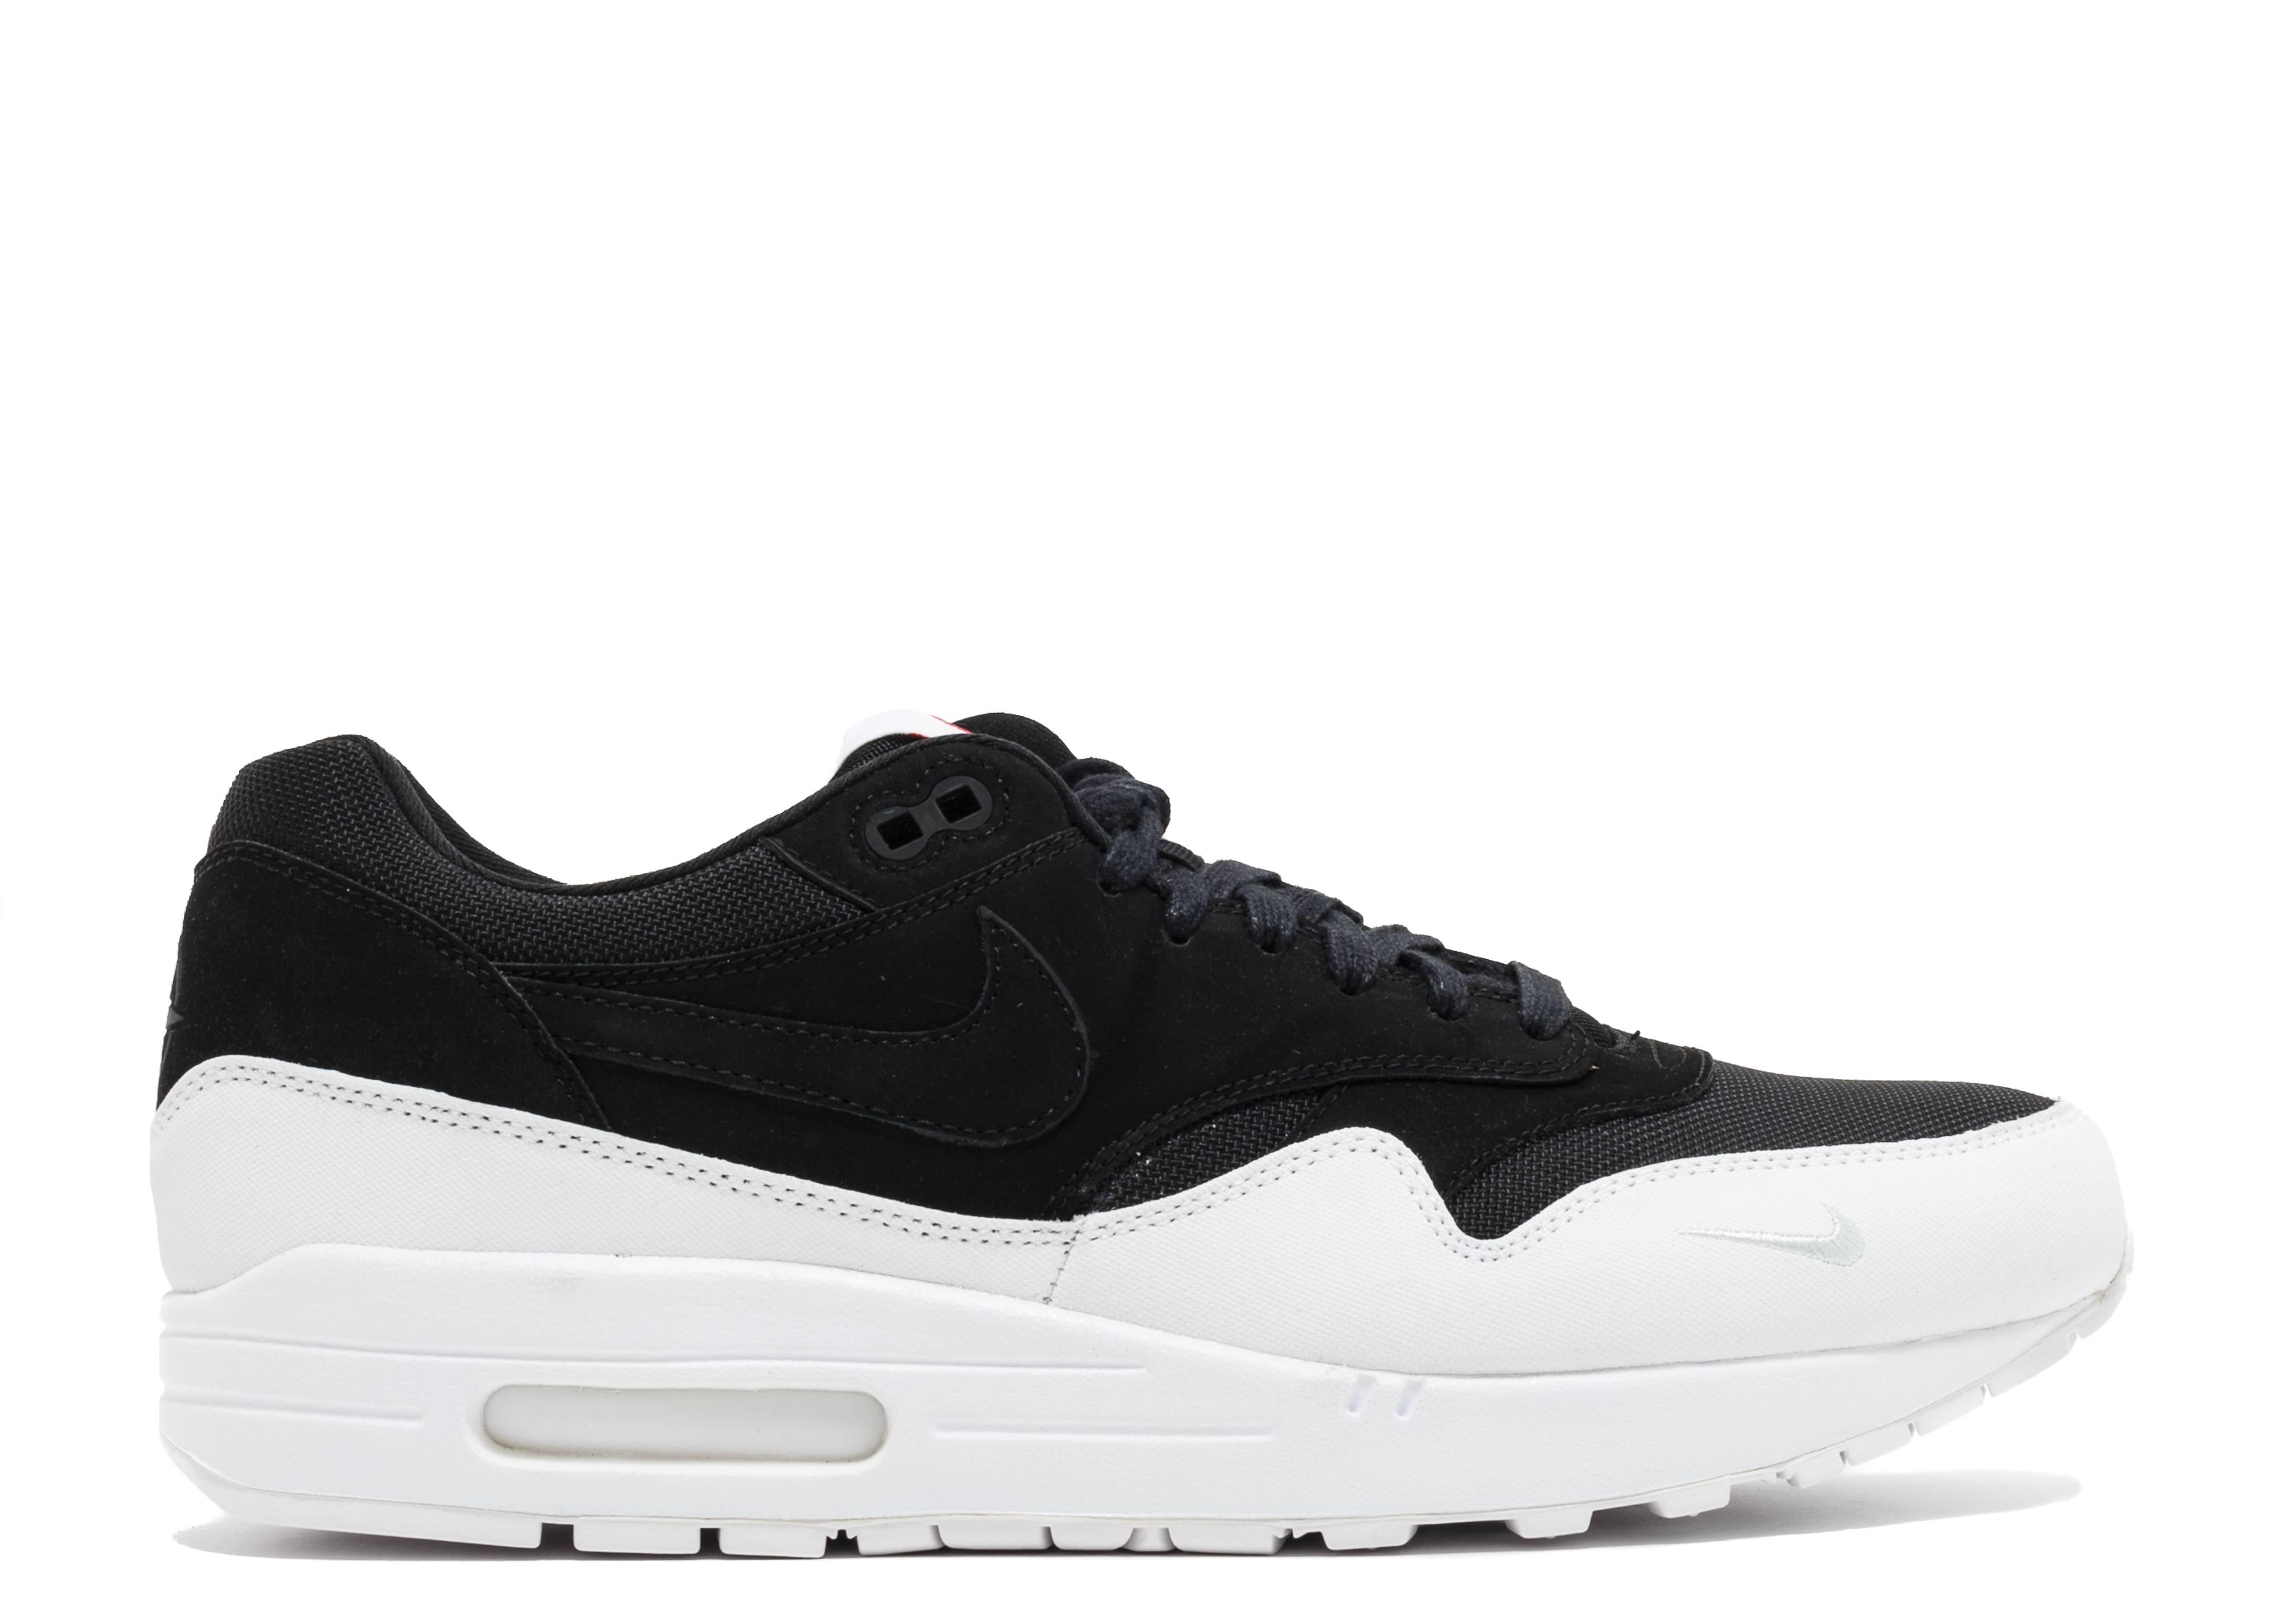 Boutique Nike Air Max 1 La 6